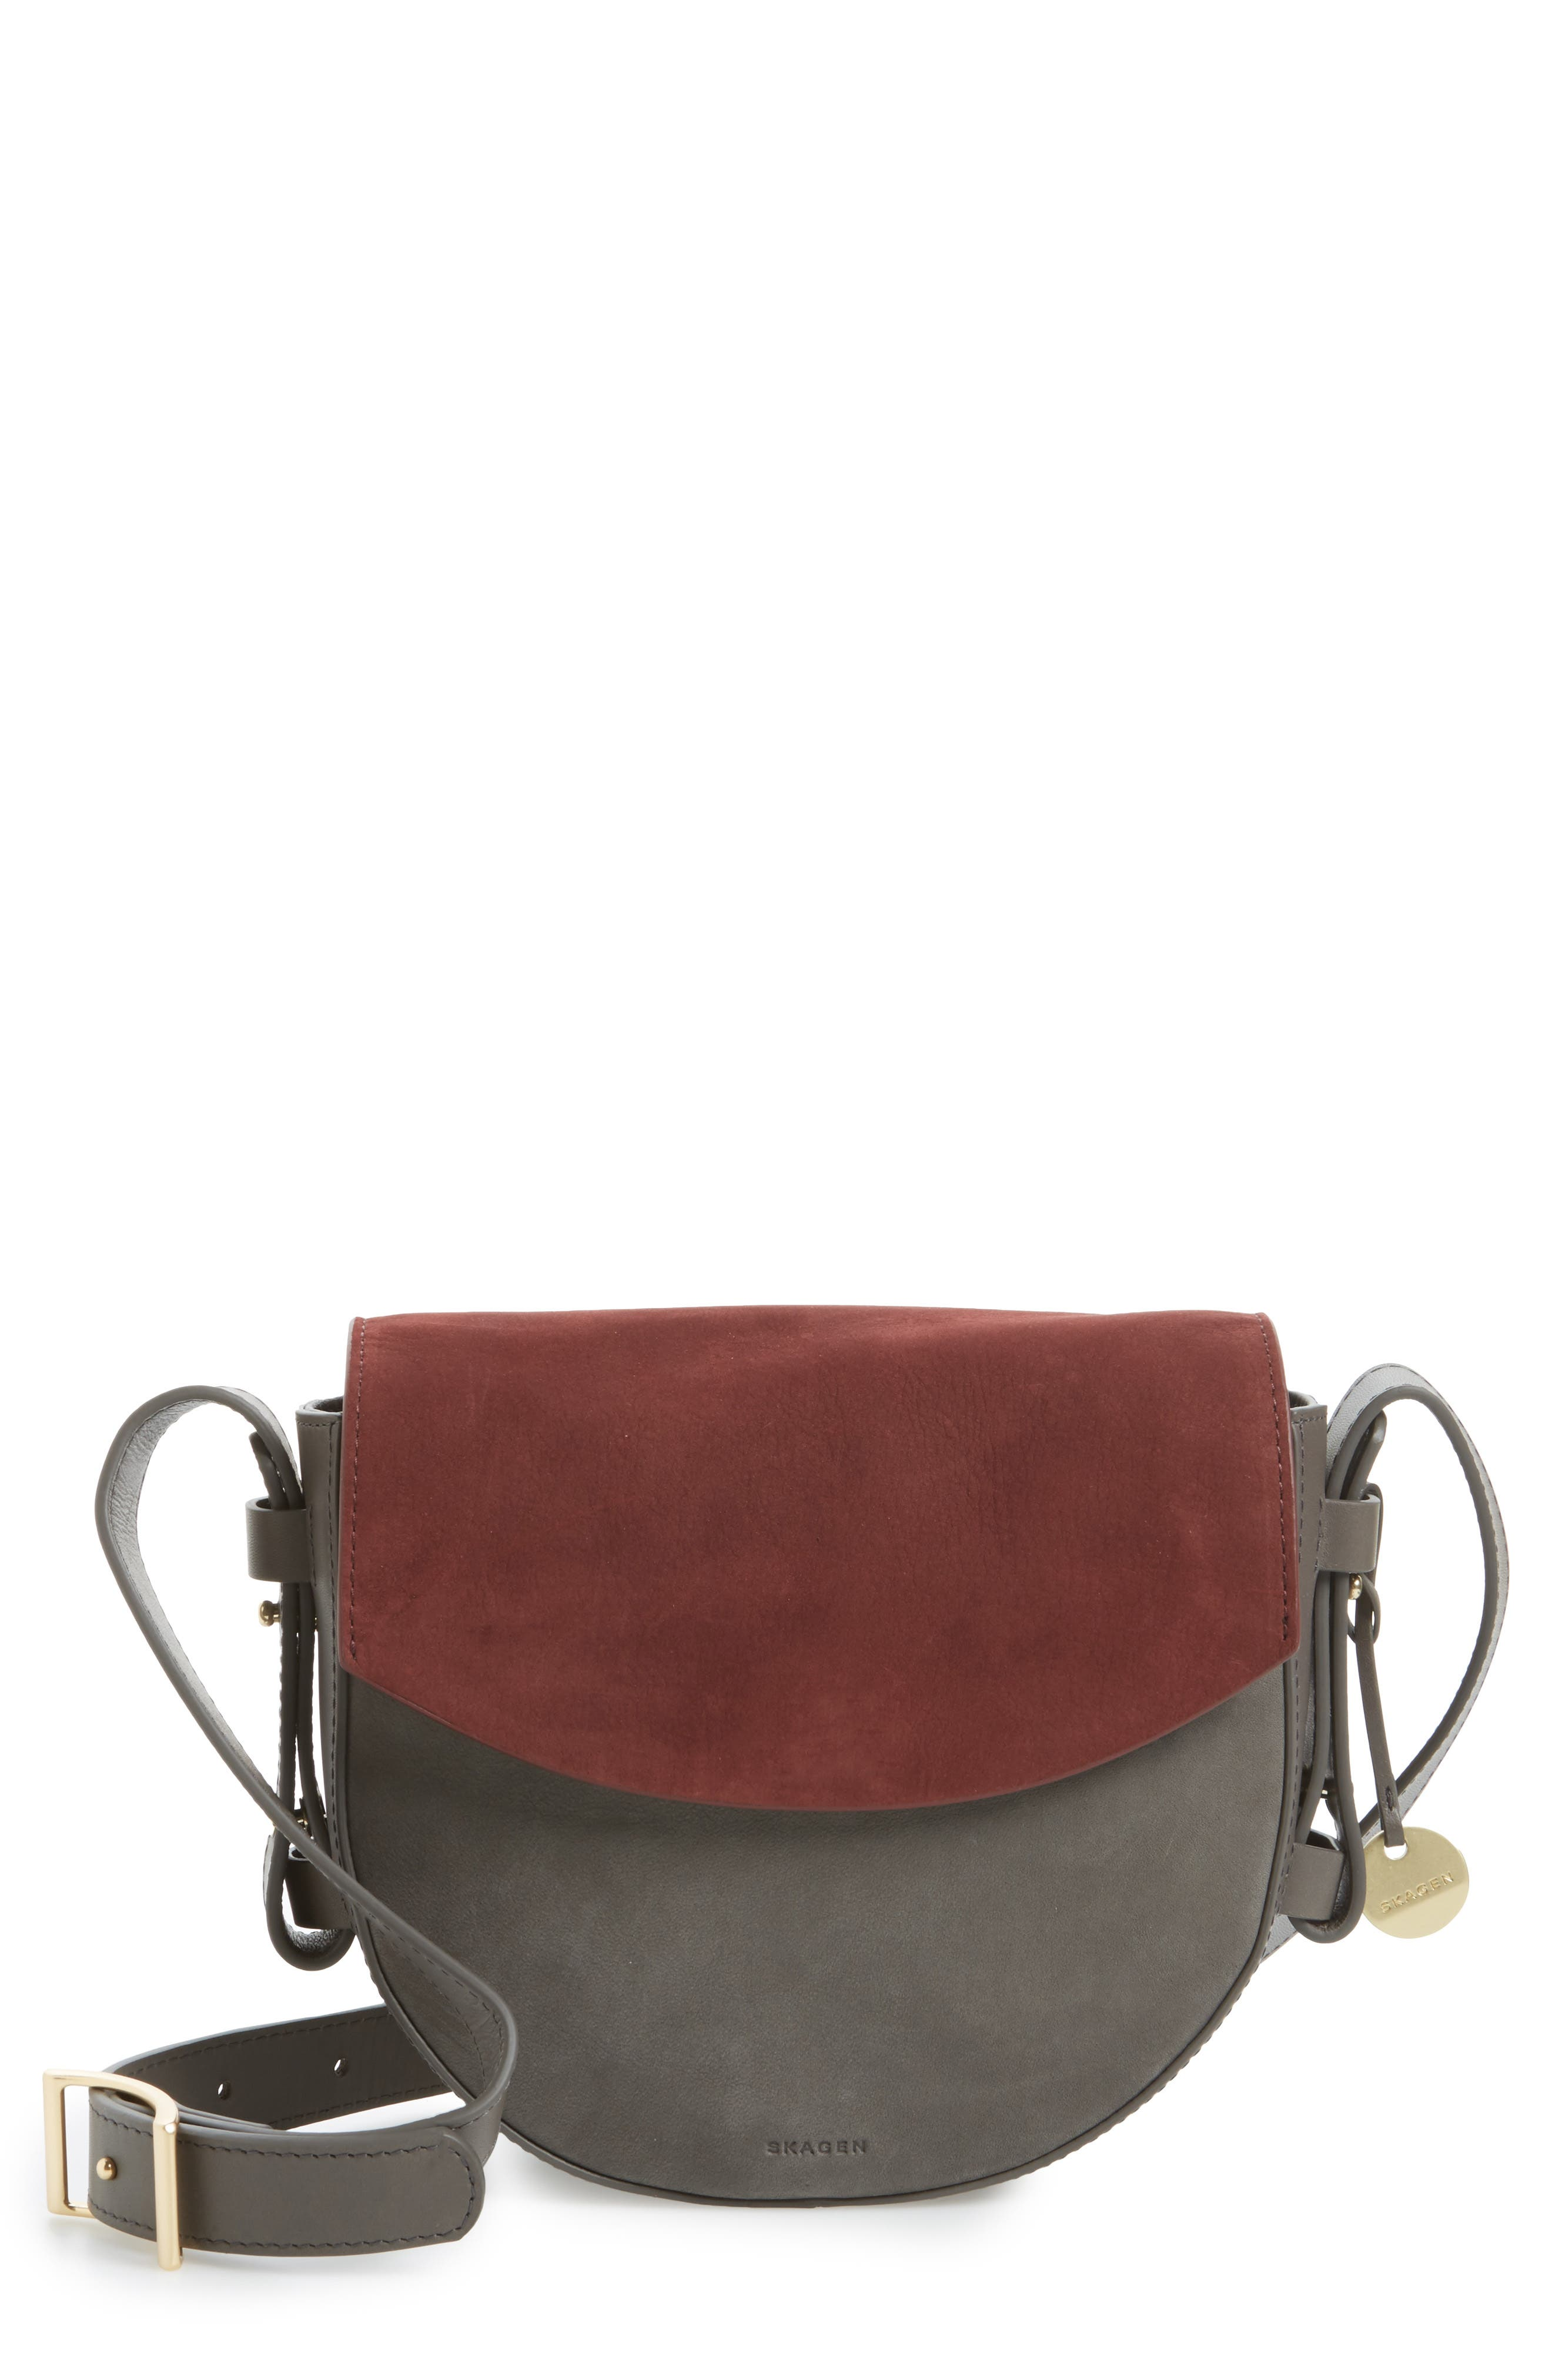 Lobelle Leather Saddle Bag,                         Main,                         color, Pewter